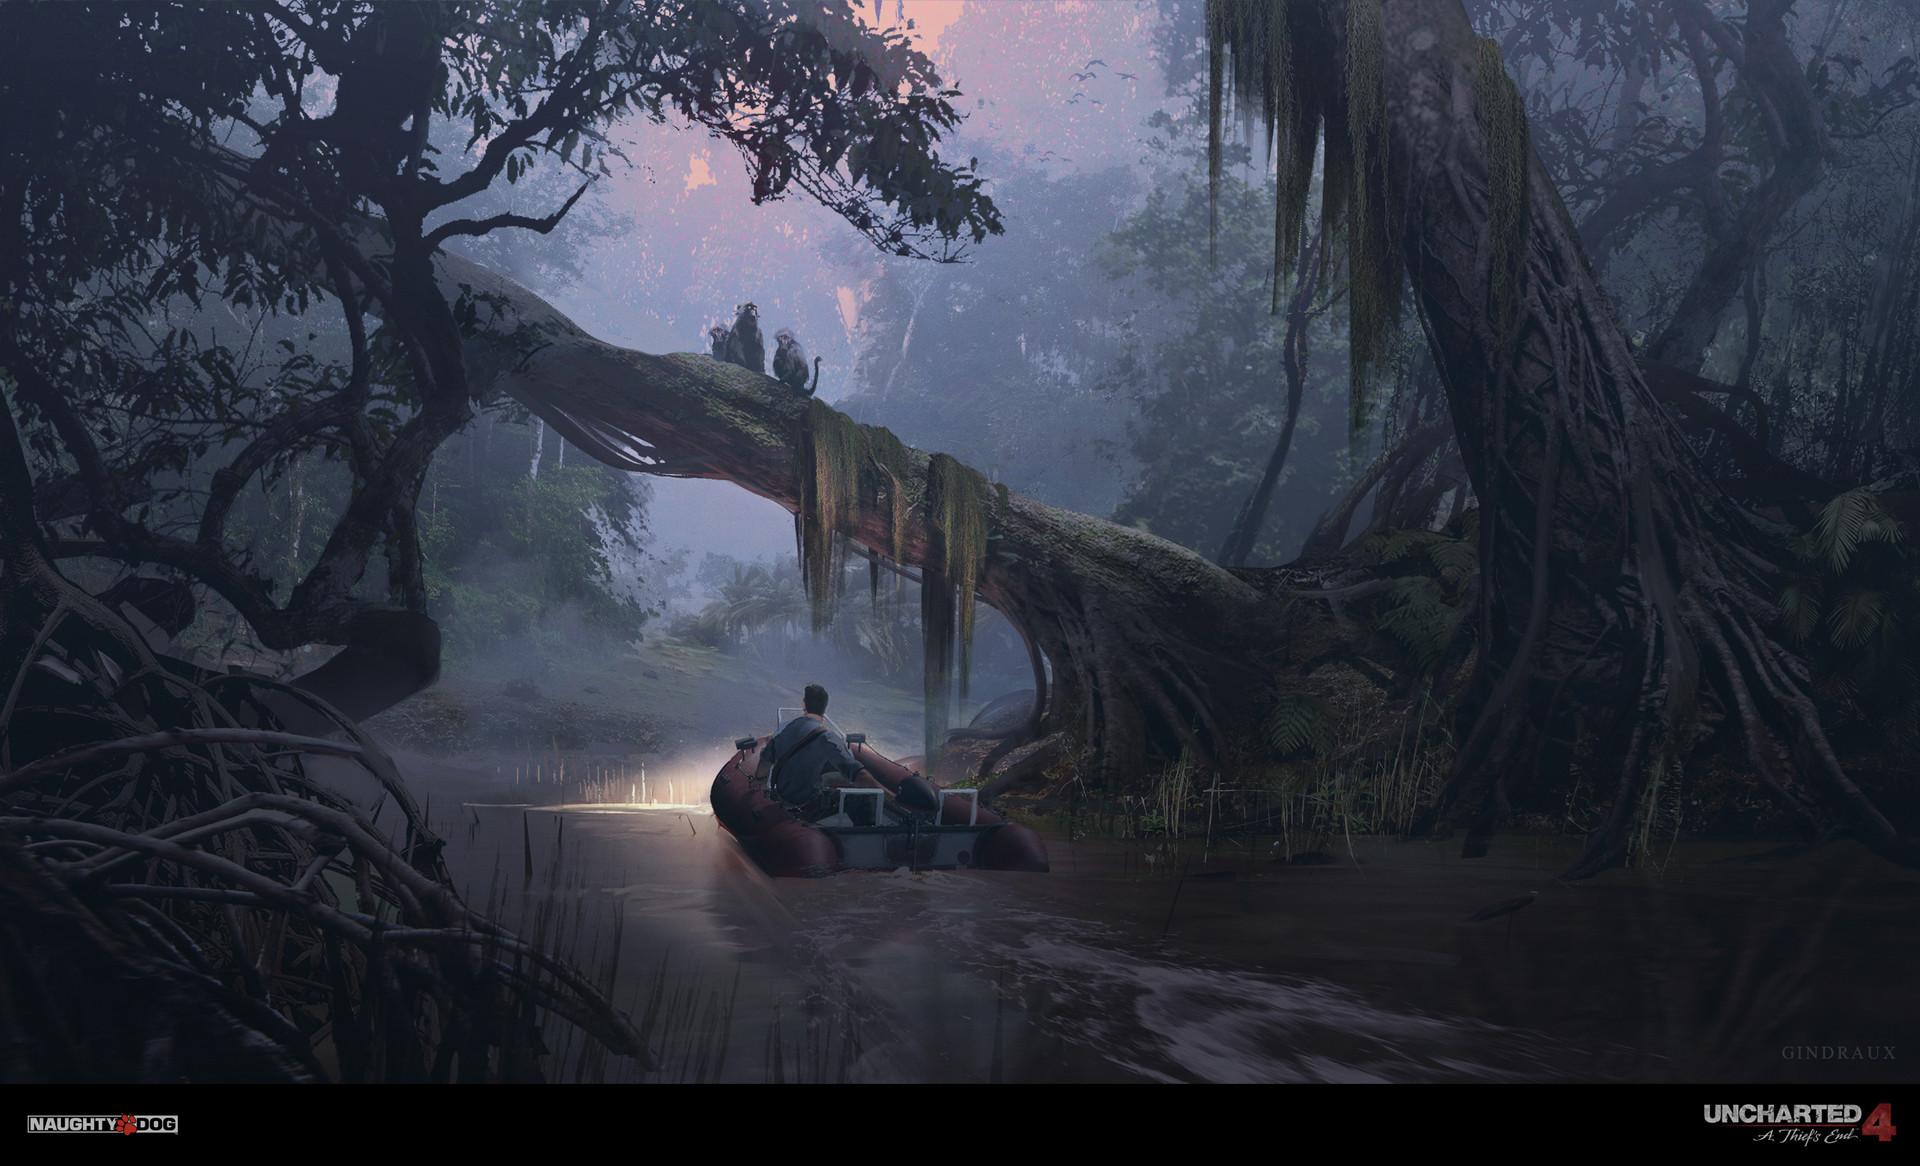 Nick gindraux jungle river3